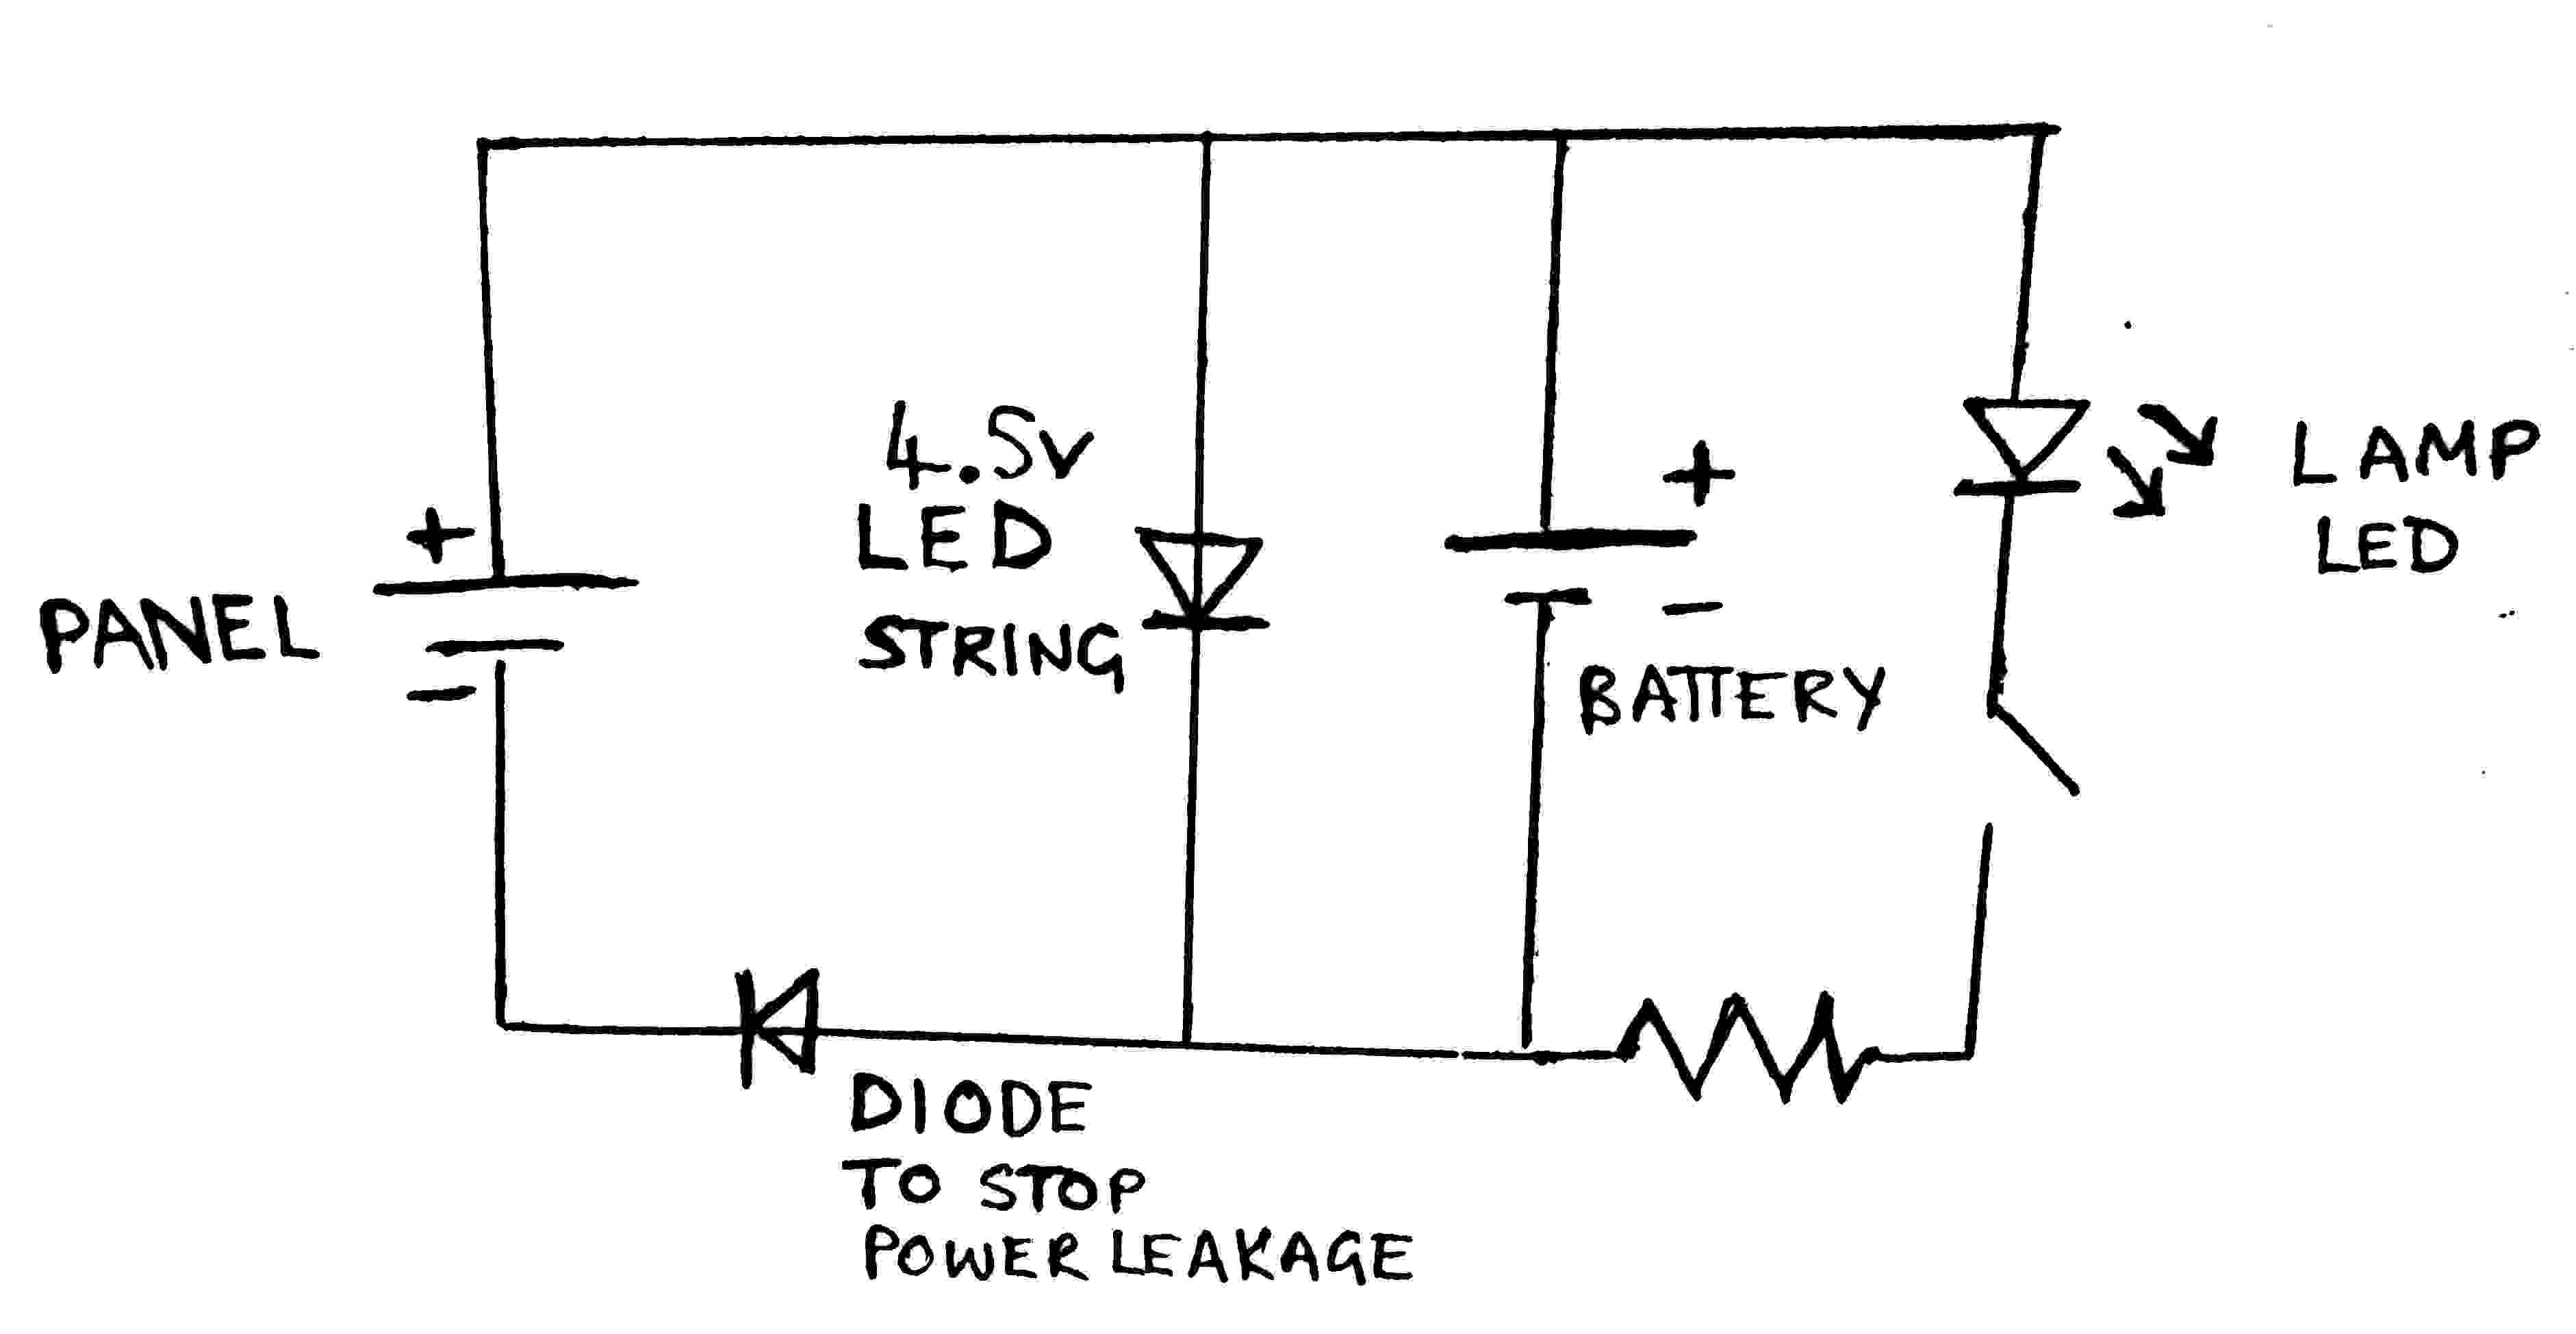 solar lighting wiring diagram wiring diagram third levelled solar panel wire diagram schematic diagrams solar power [ 3763 x 1948 Pixel ]